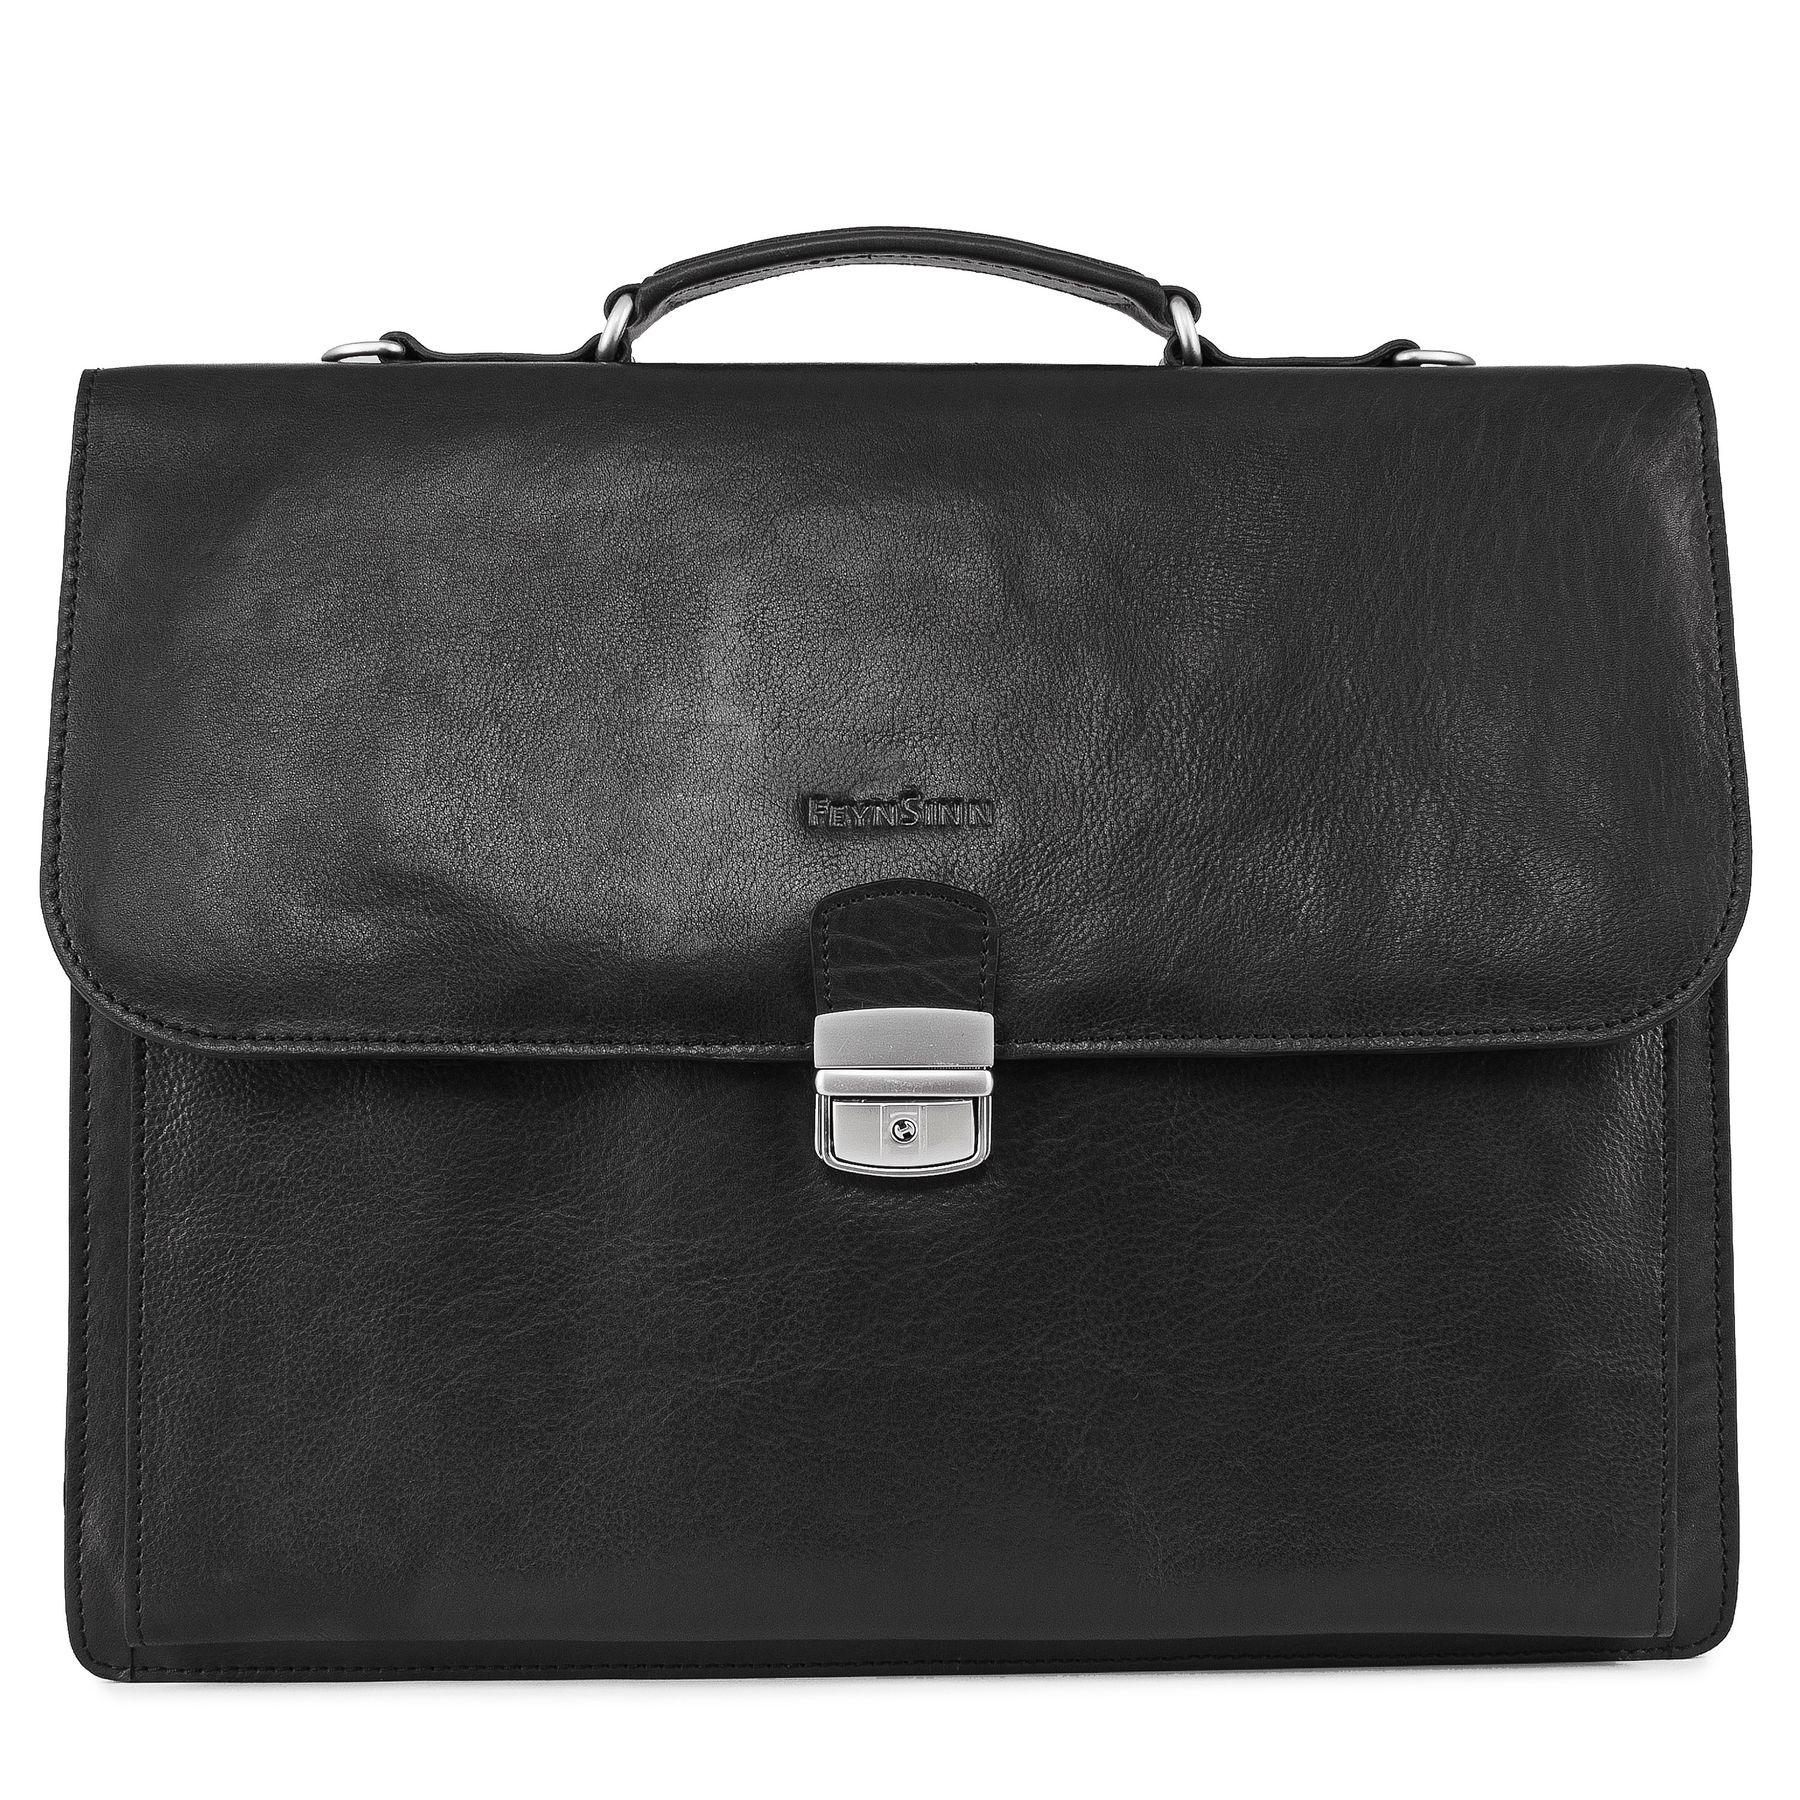 691e874162 Feynsinn briefcase emilio office work bag black smooth leather portable  computer briefcase shoulder strap business jpg